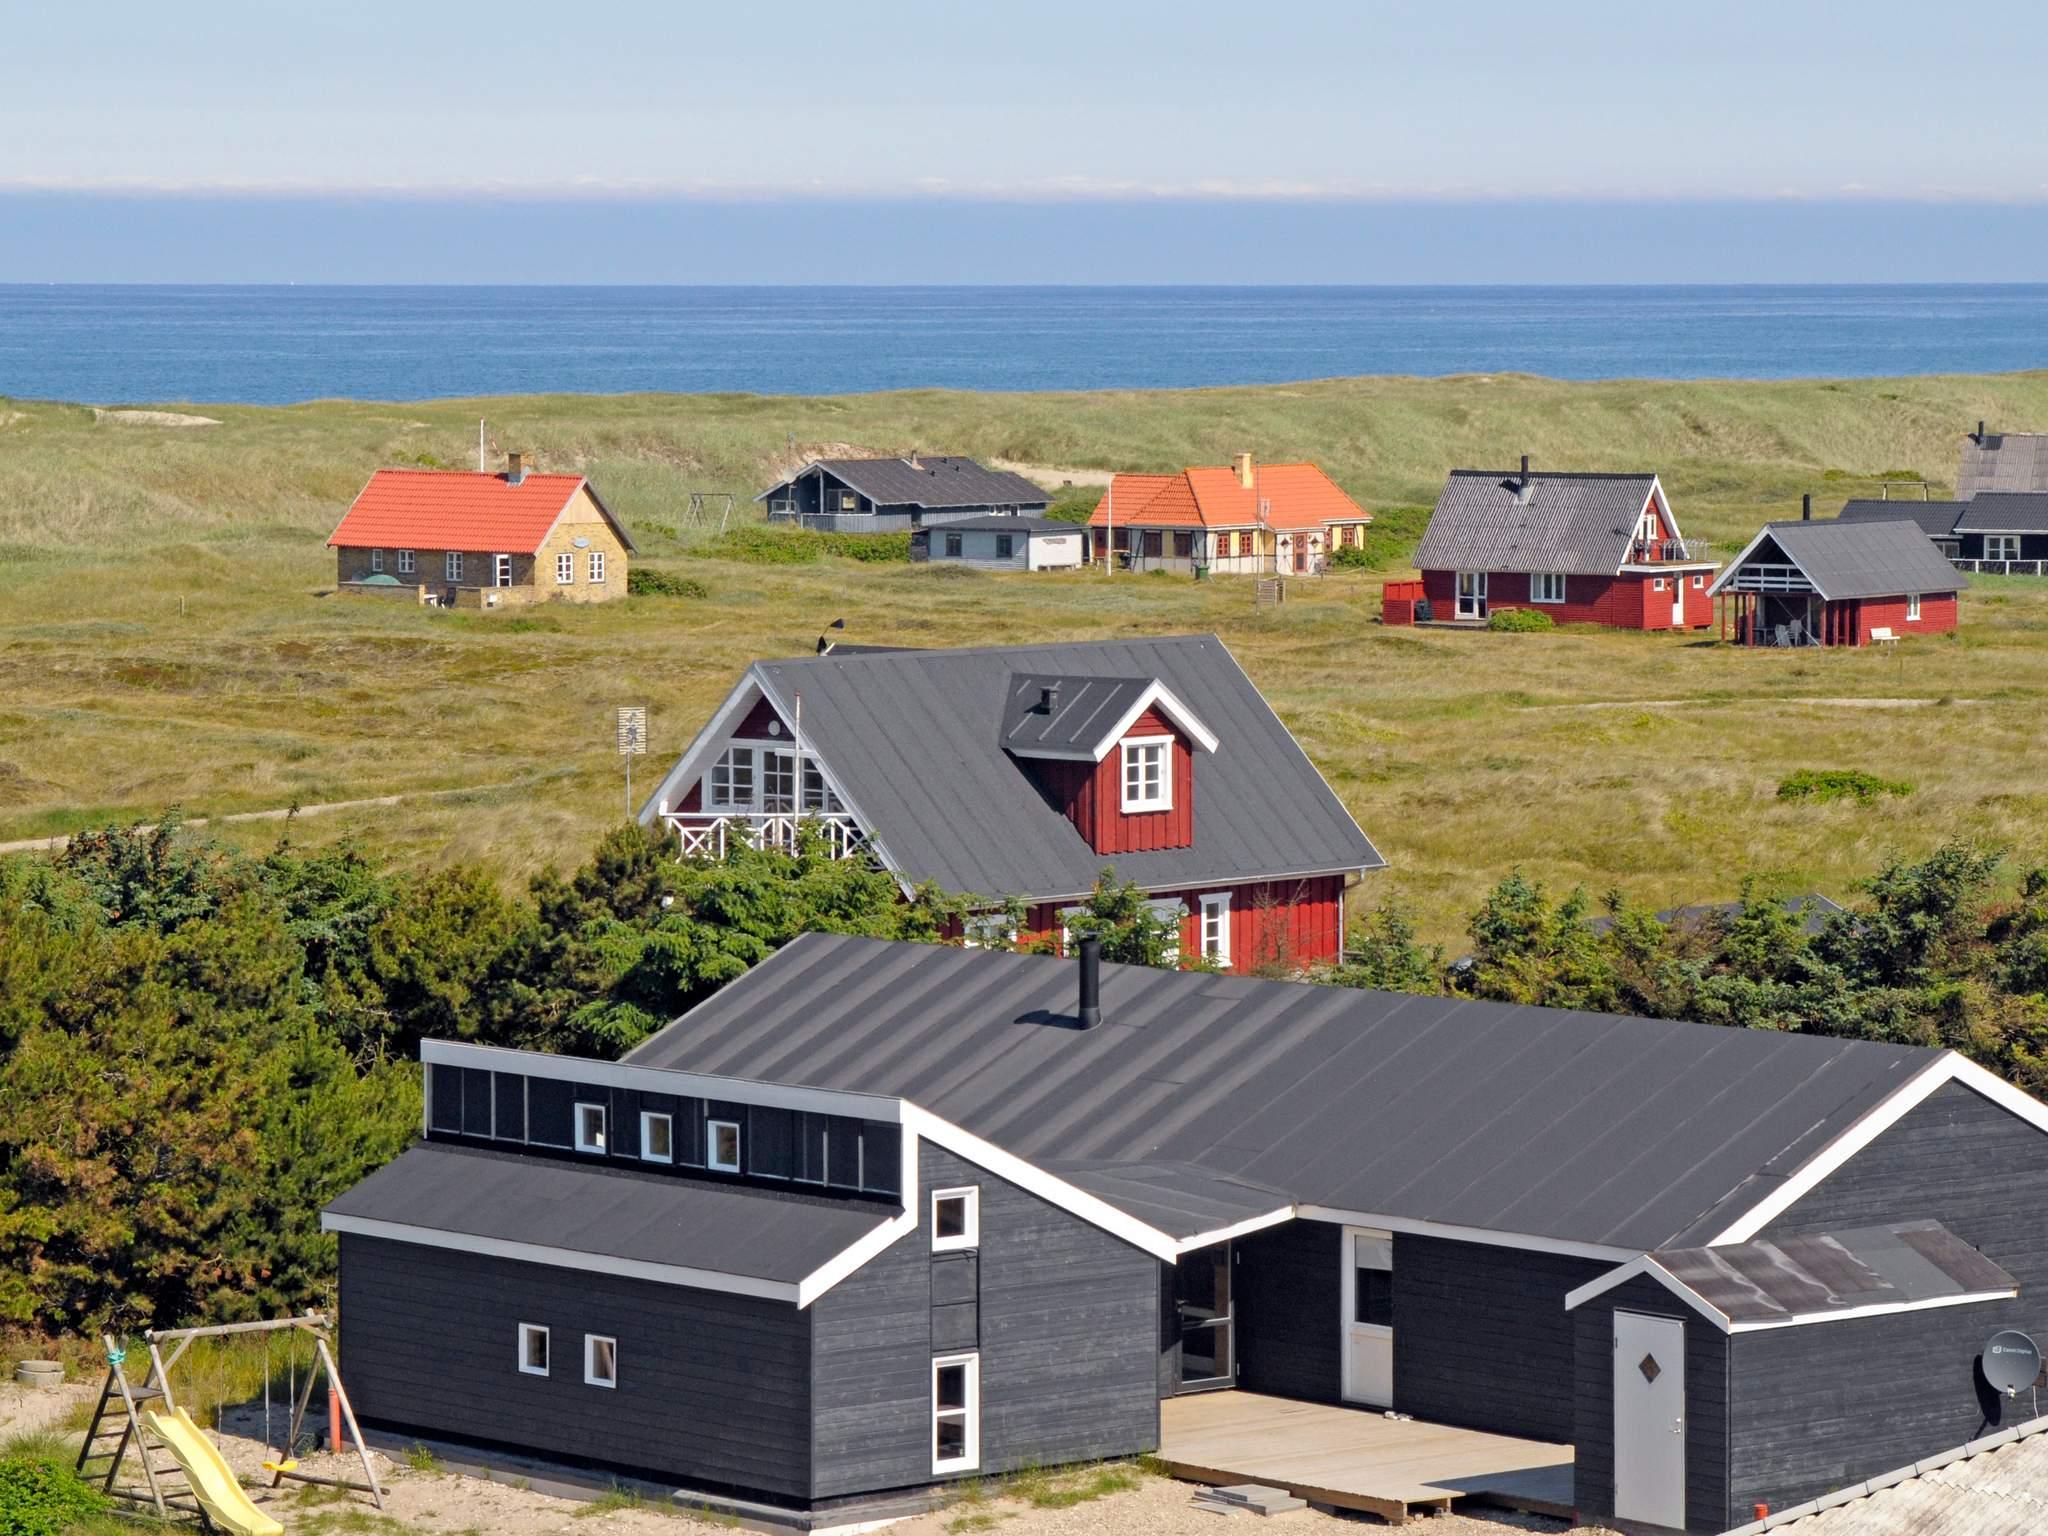 Ferienhaus Vrist (377922), Vrist, , Limfjord, Dänemark, Bild 1